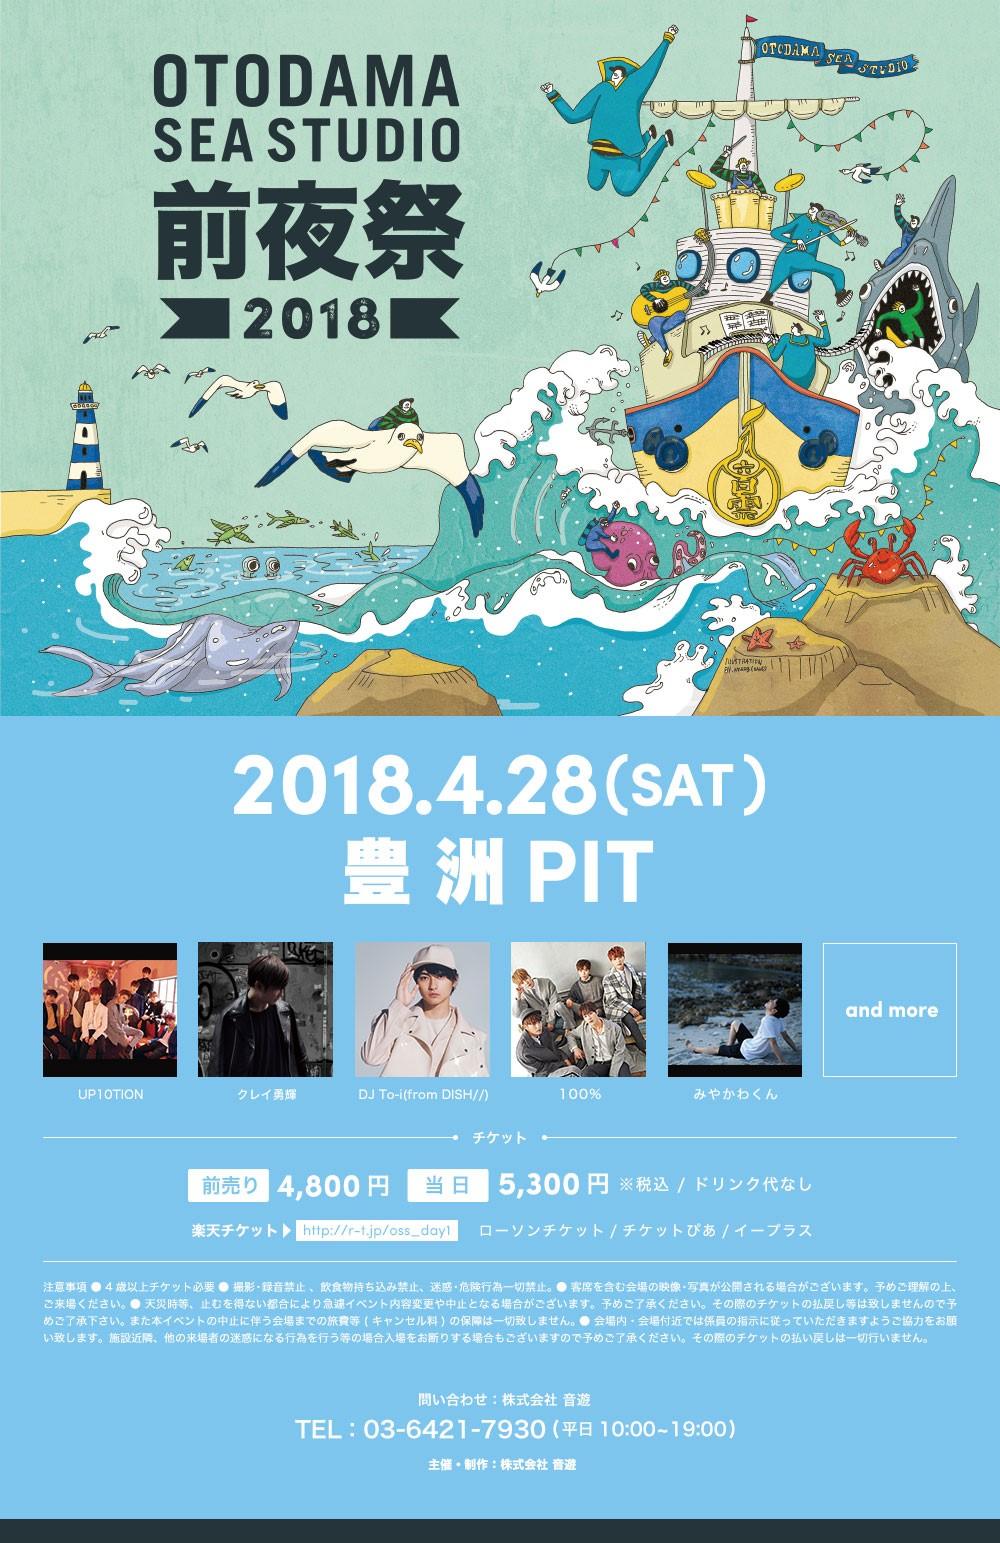 【4月28日出演】OTOAMA SEA STUDIO 前夜祭 2018